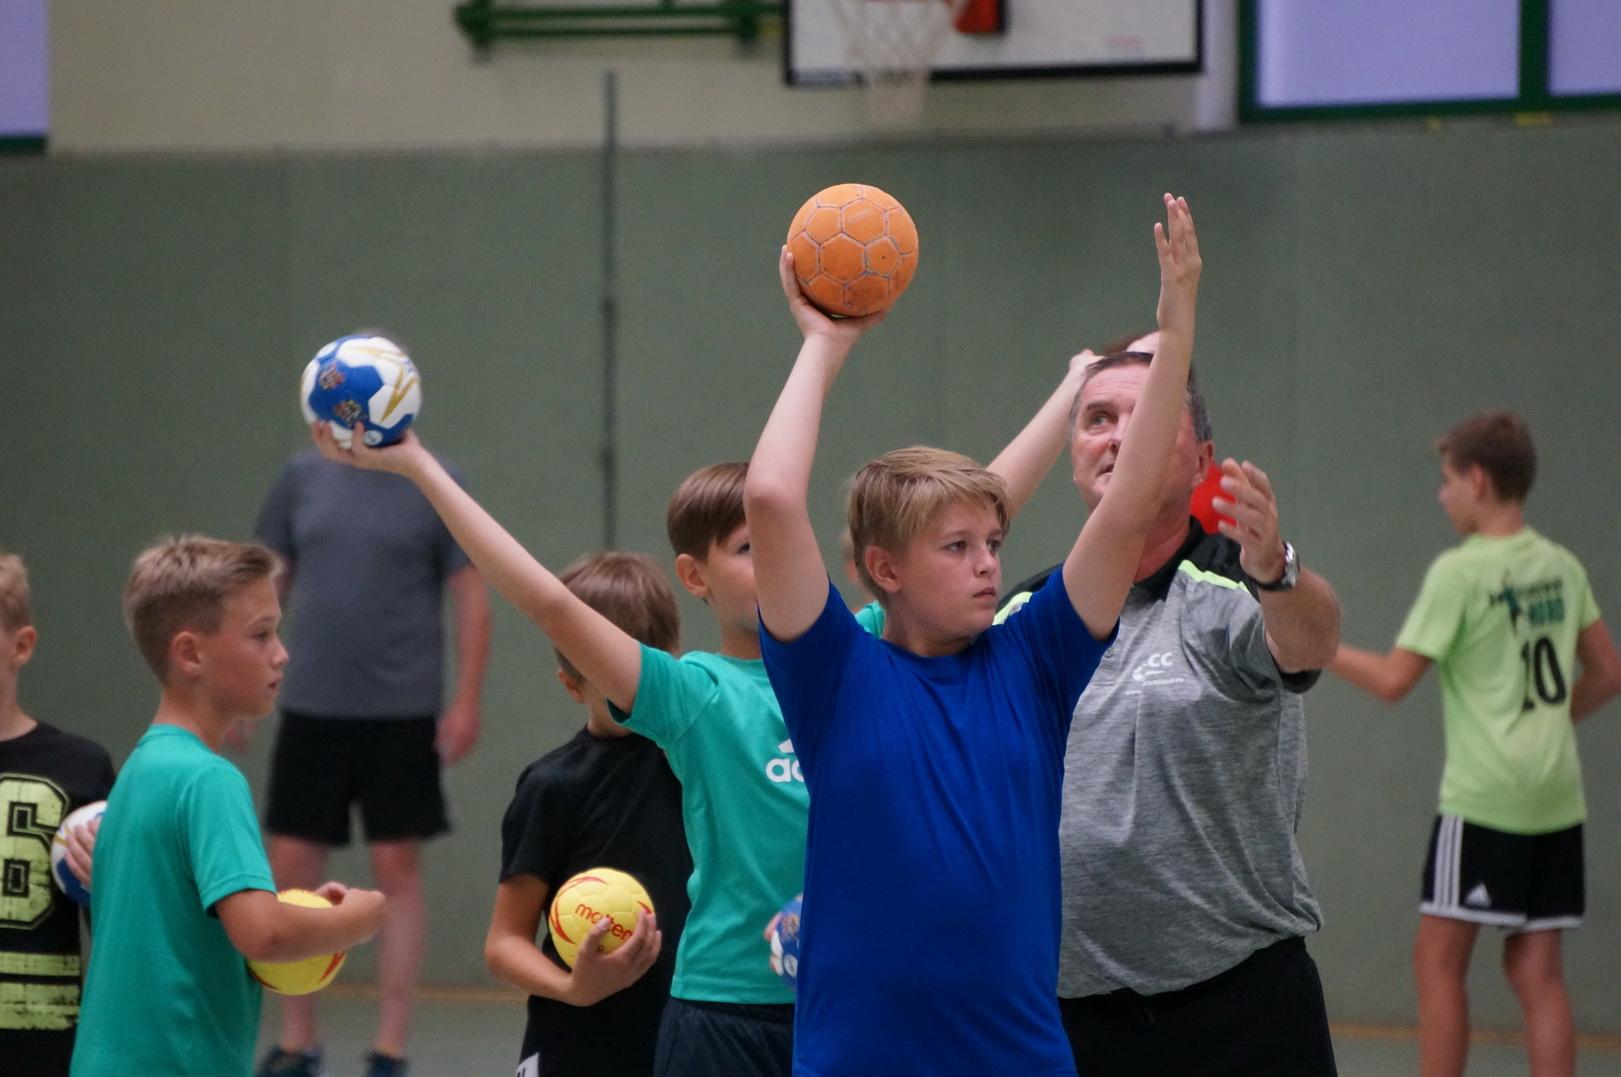 201808_Handballcamp_SDH_MG_078w